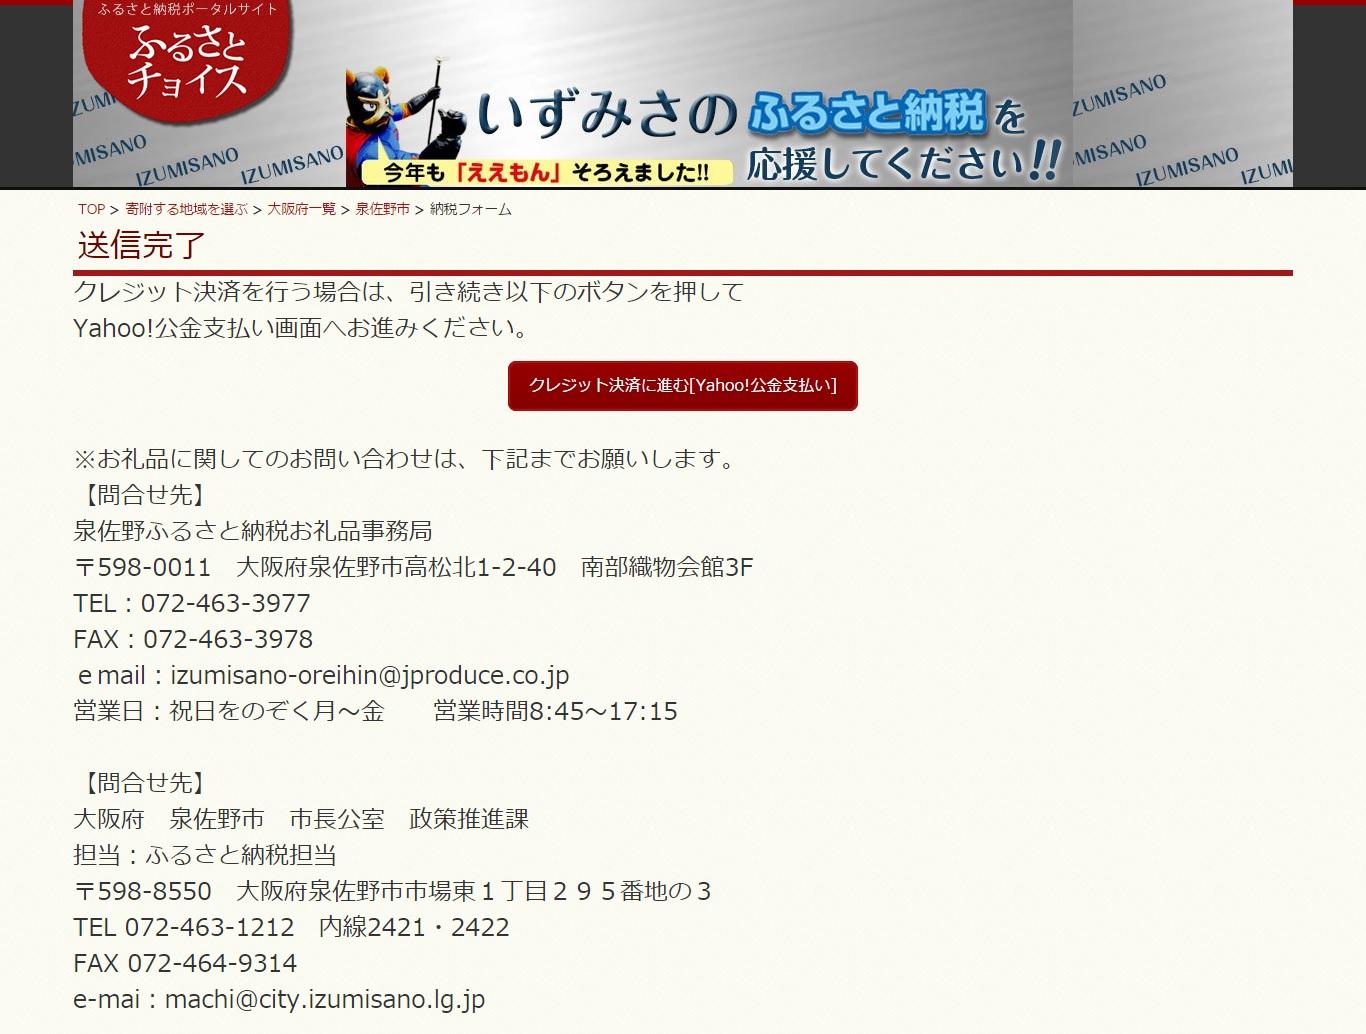 setuyaku-furusato-choice2015-search-izumisano-order-send